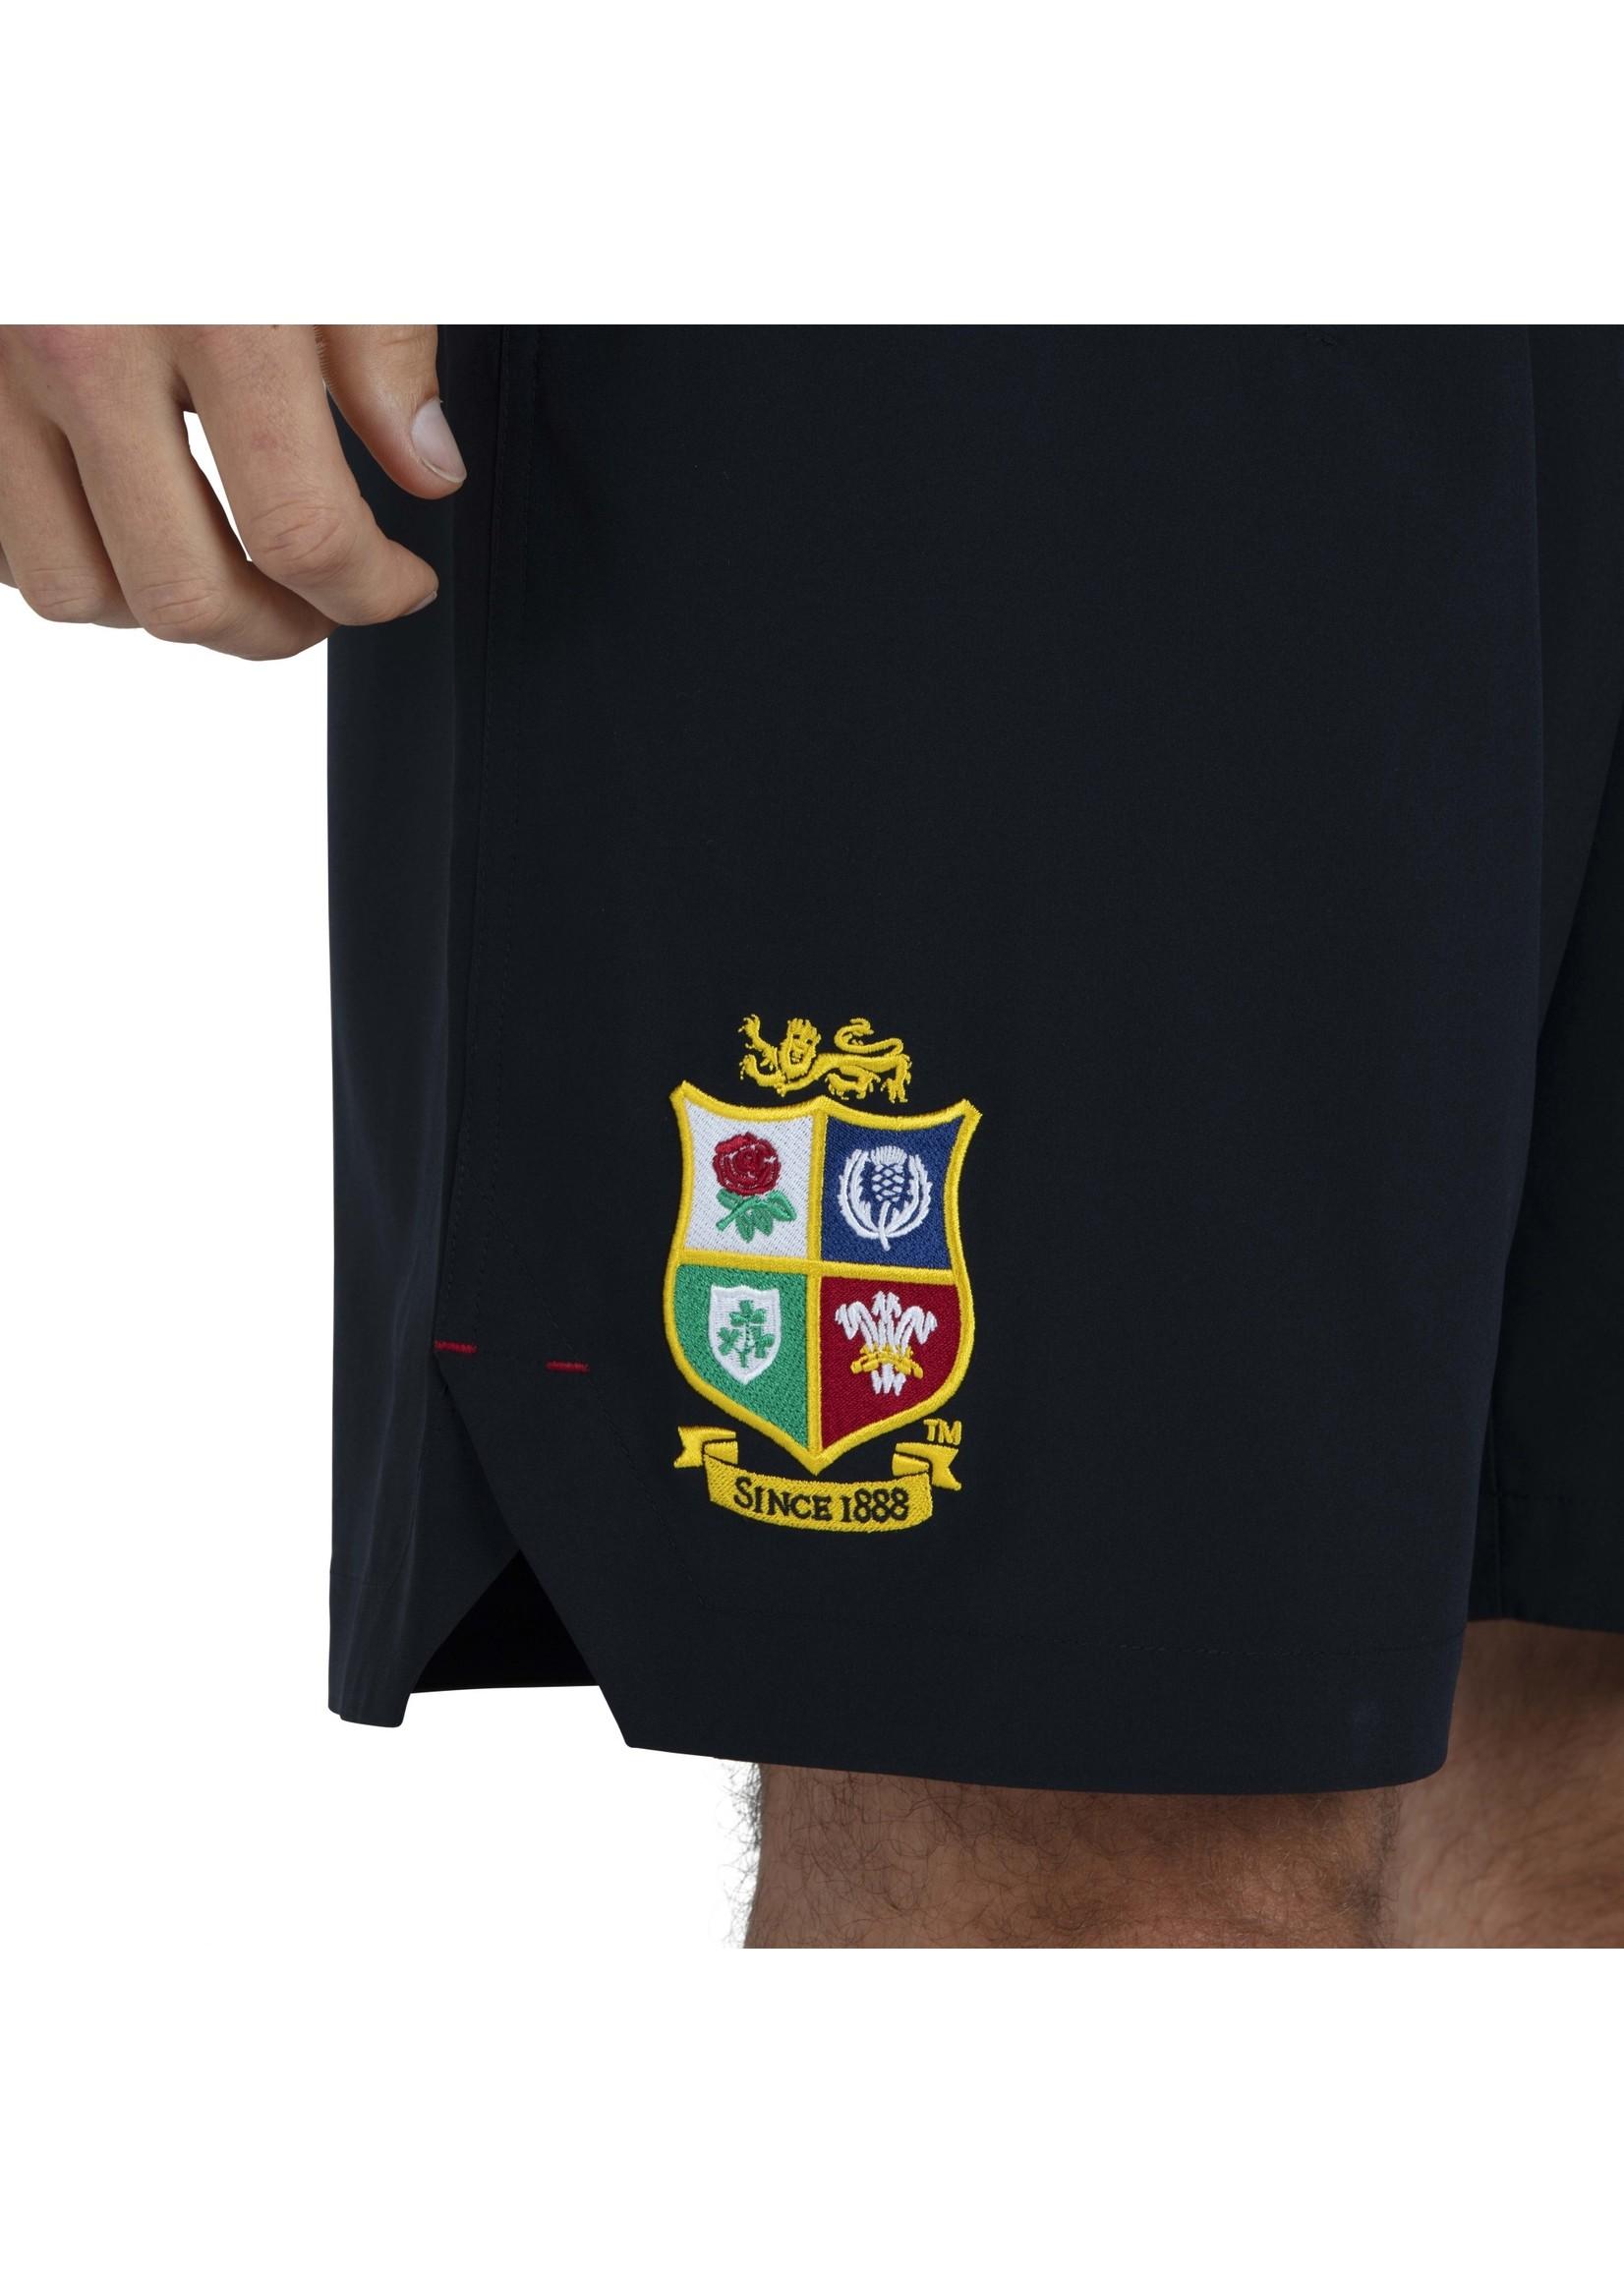 "Canterbury British & Irish Lions - 8"" Woven Gym Short (2021) - Black"